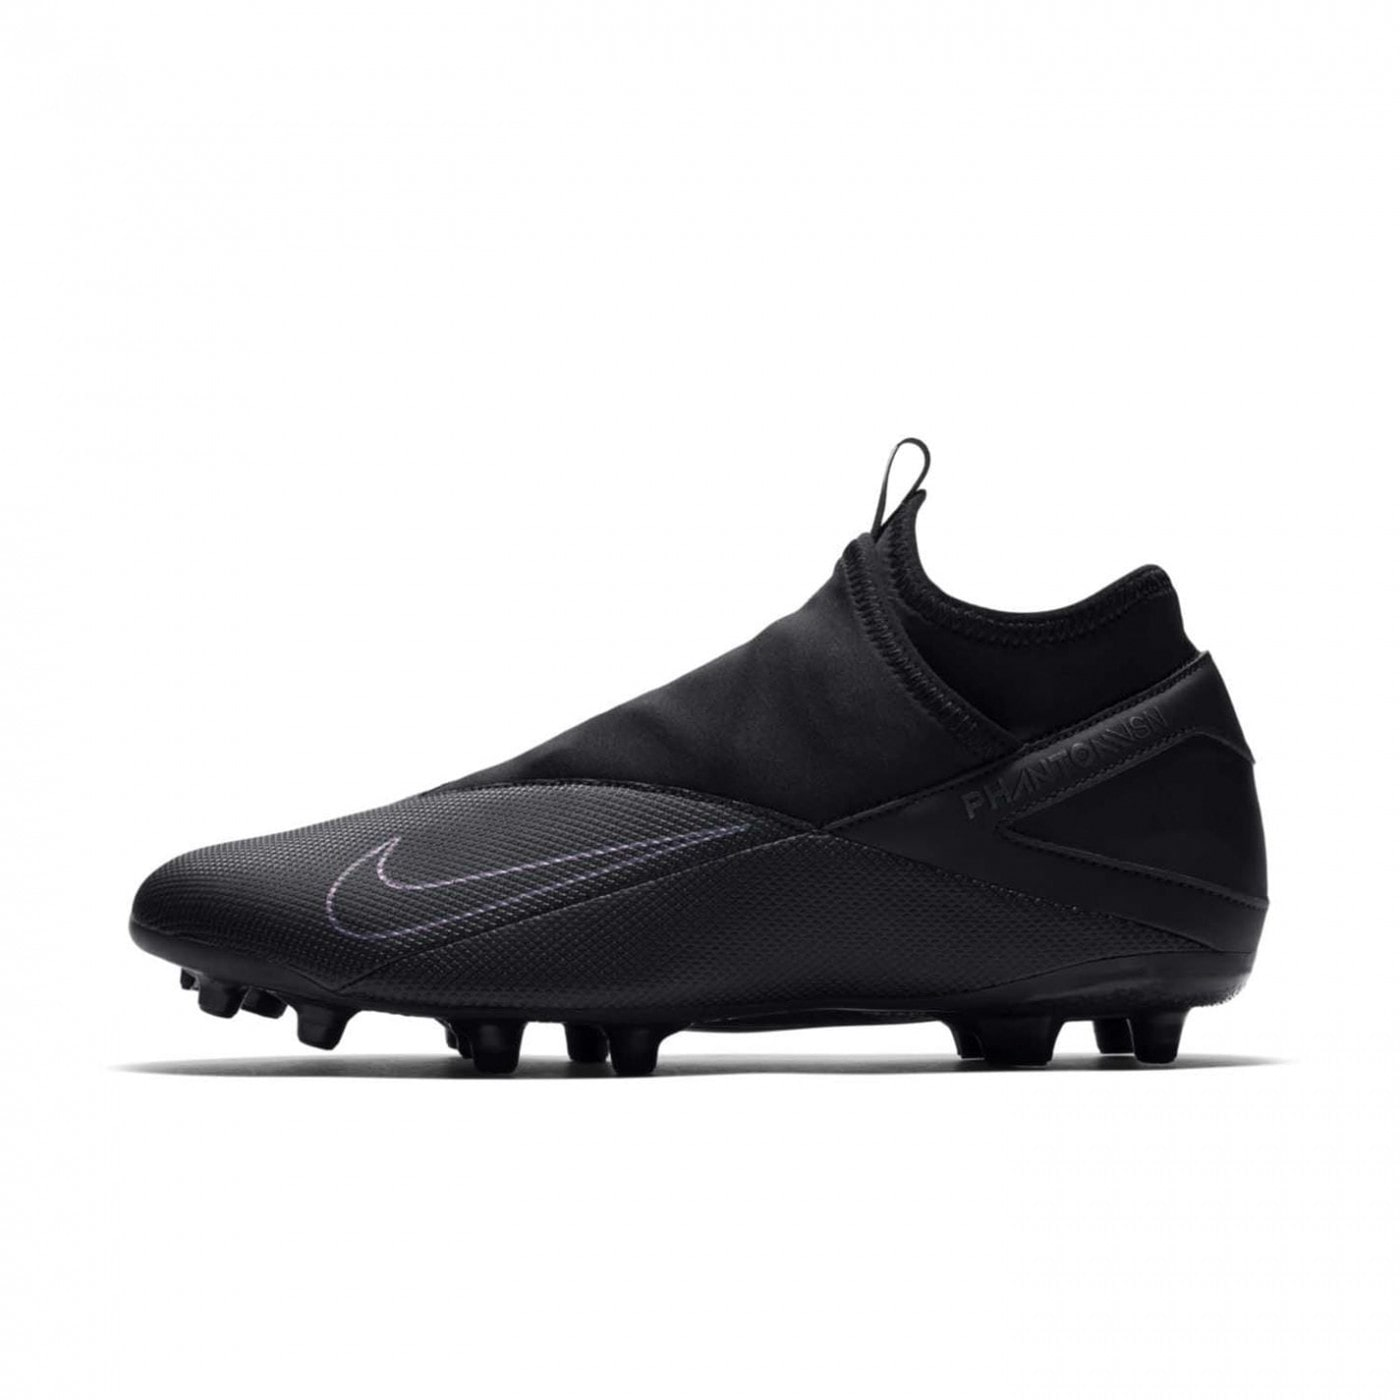 Nike Phantom Vision 2 Club Dynamic Fit MG Multi-Ground Soccer Cleat